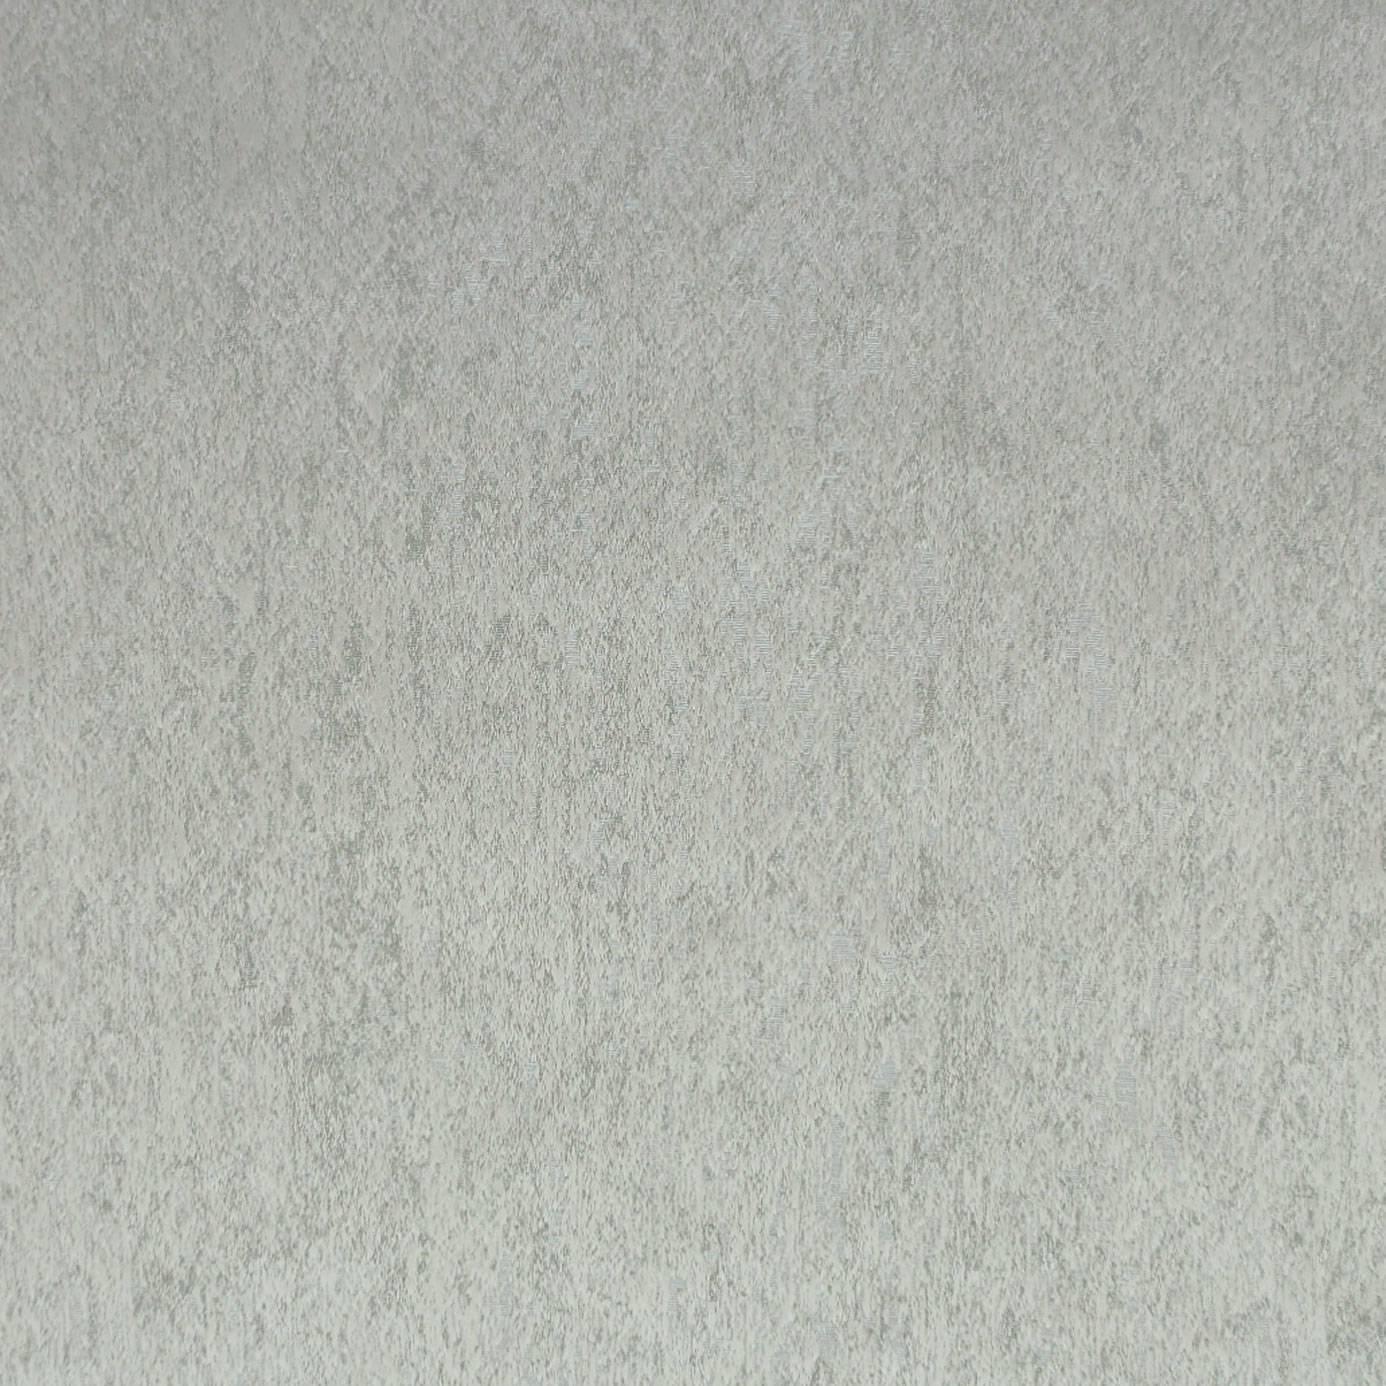 Helios Fabric Sterling 3544 946 Prestigious Textiles